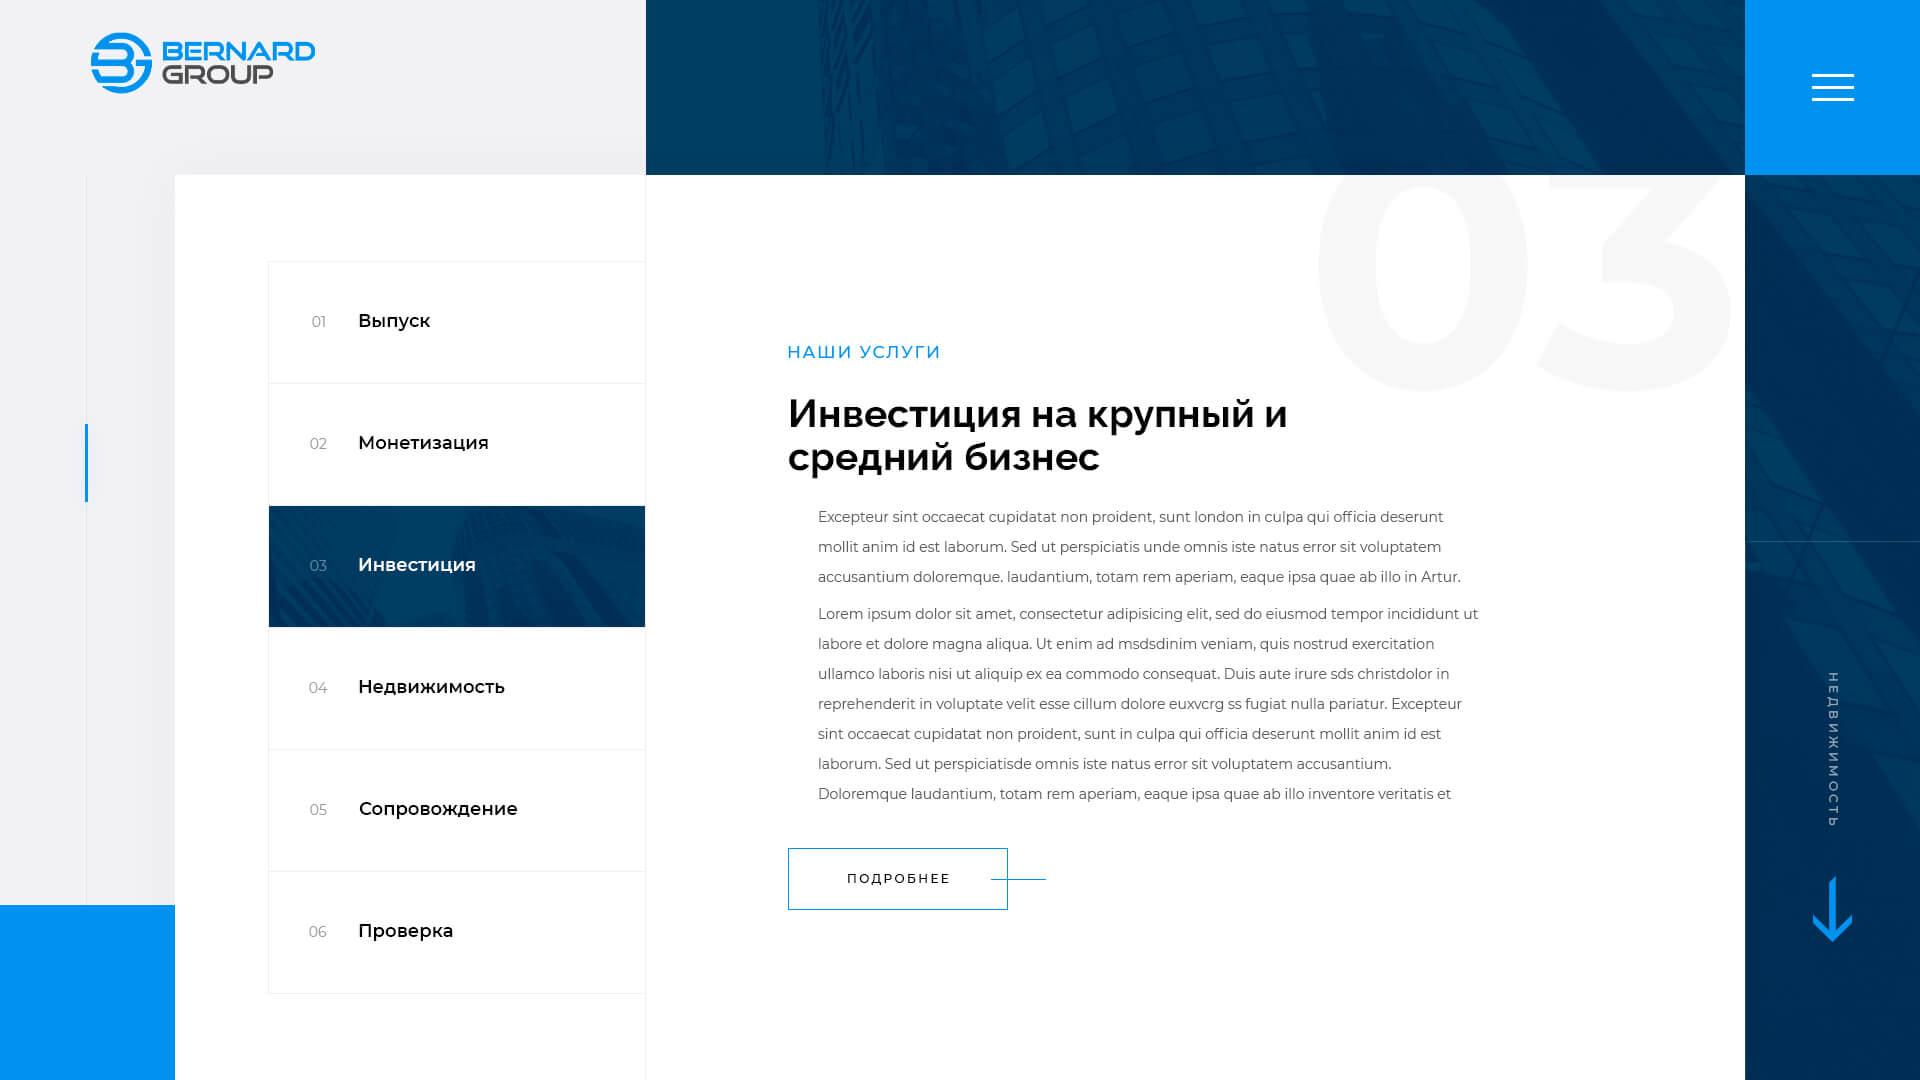 Bernard_Group_04_Third_Service_Page_1.0